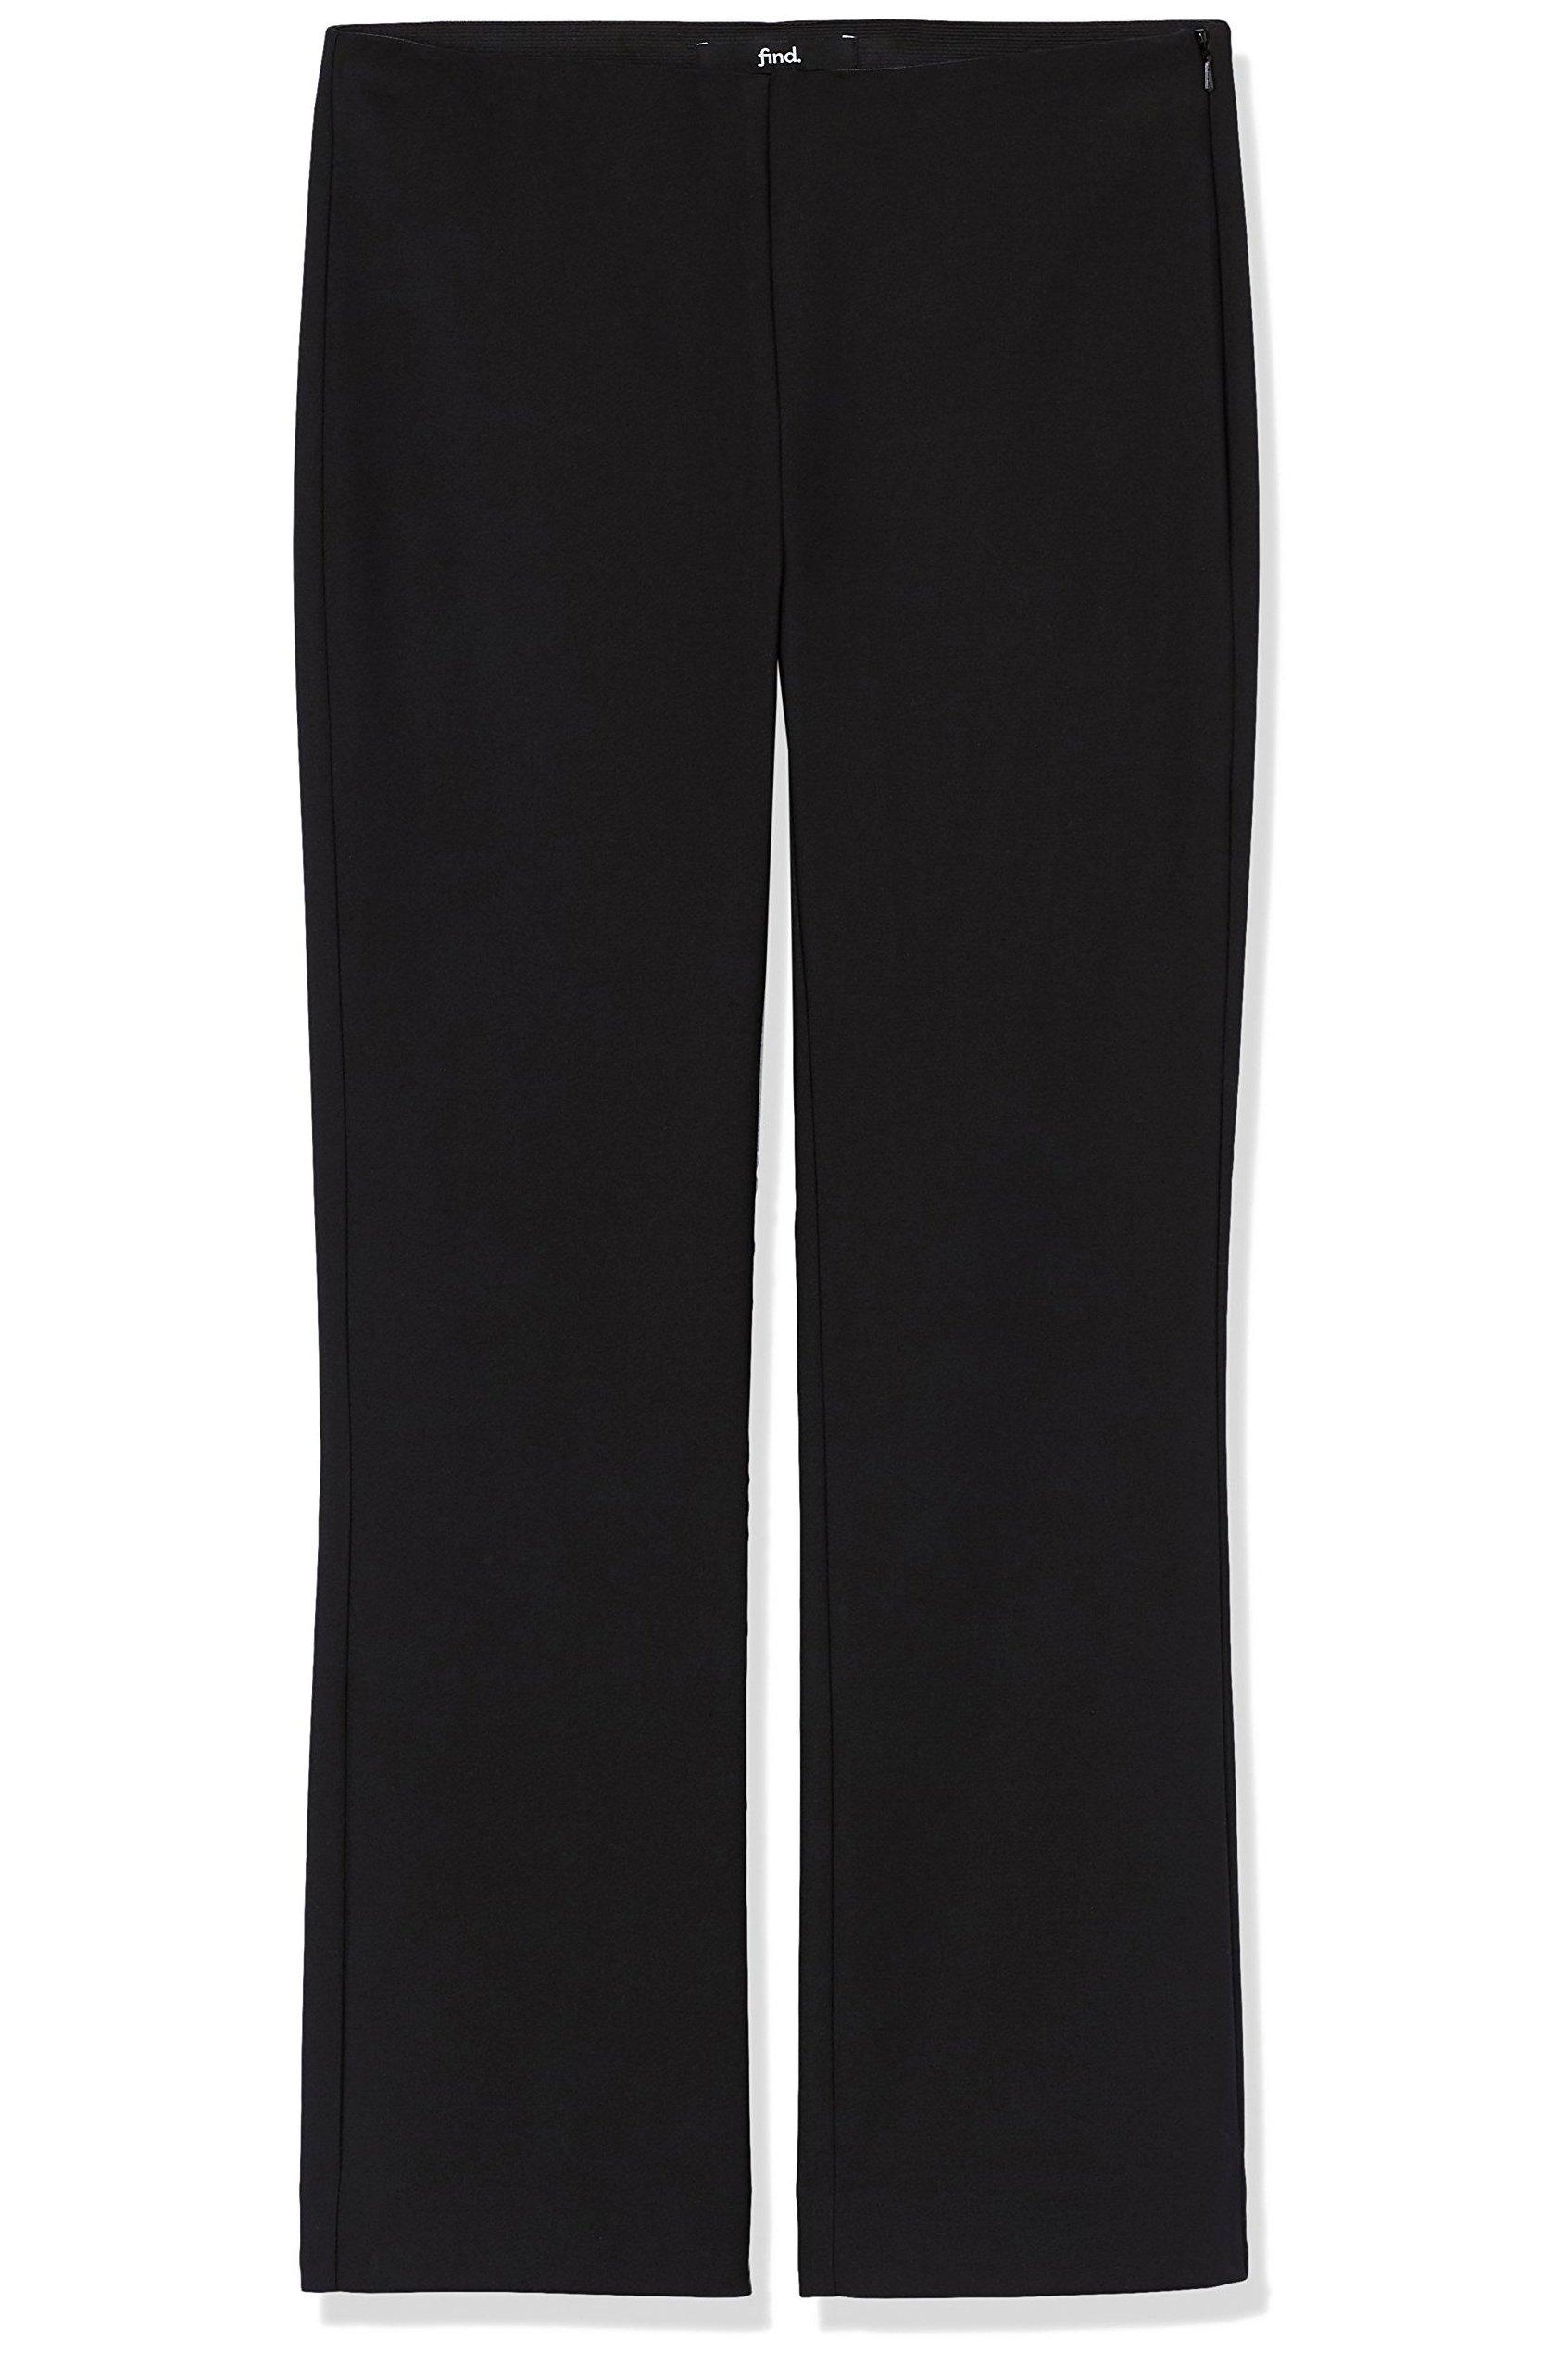 FIND Pantalon Large Court Femme